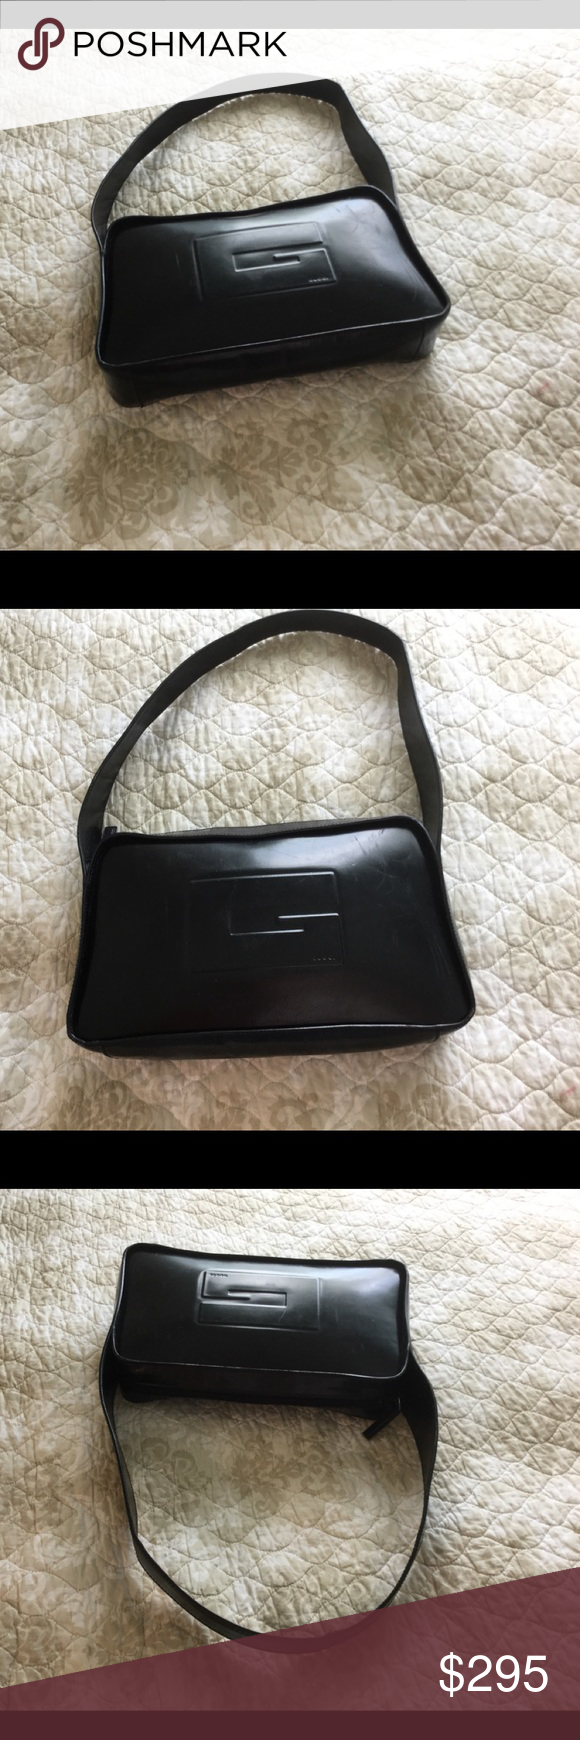 9d9ca33bf6ad7 GUCCI Vintage Black Leather Calf Skin Gucci Purse GUCCI Vintage Bag ...